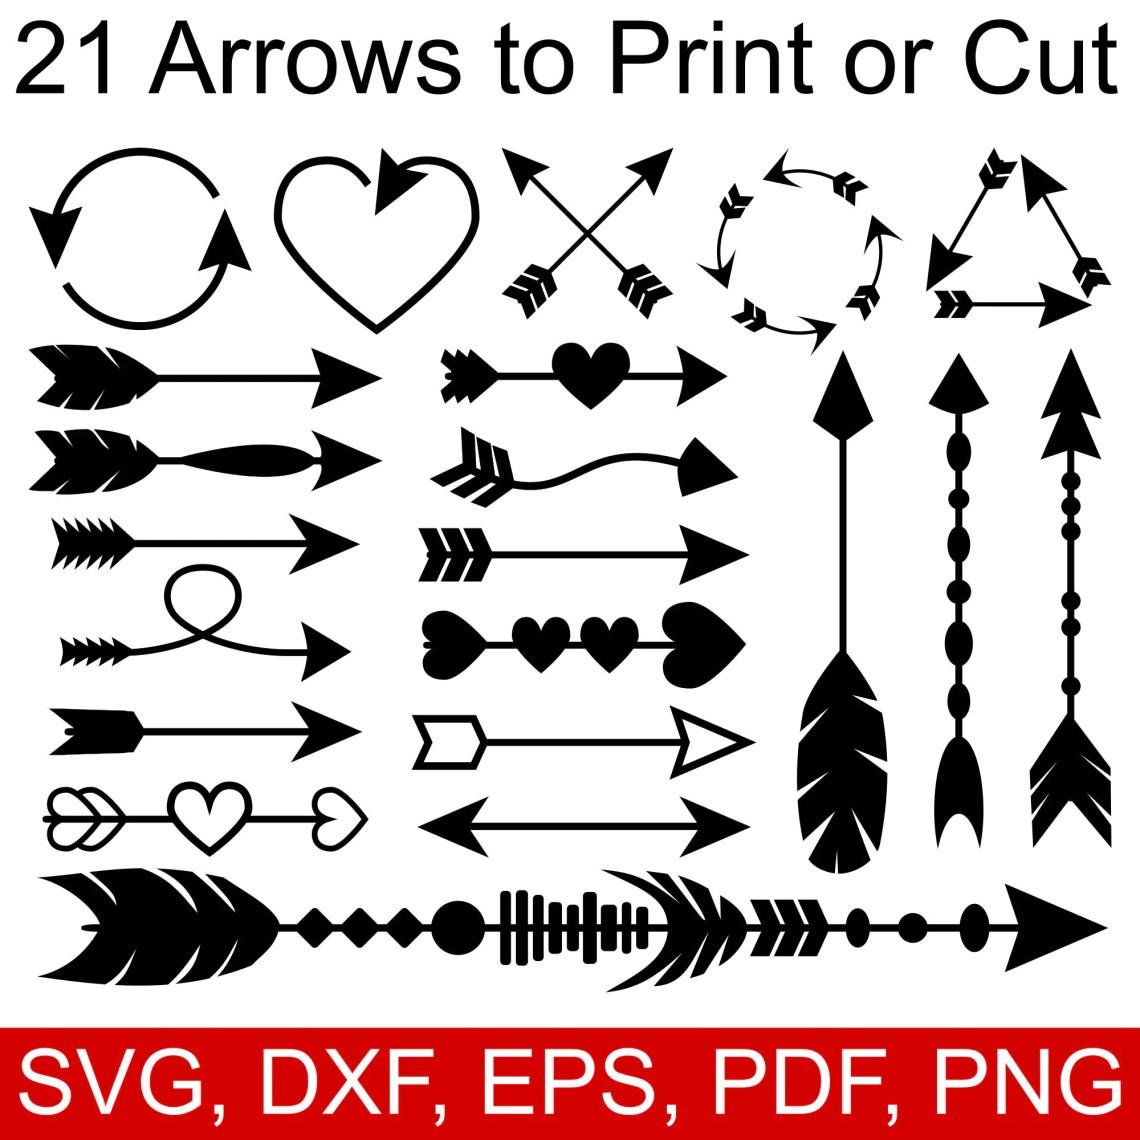 Download 21 Arrow SVG files Arrow Clipart Arrow DXF Arrow PDF Arrow ...